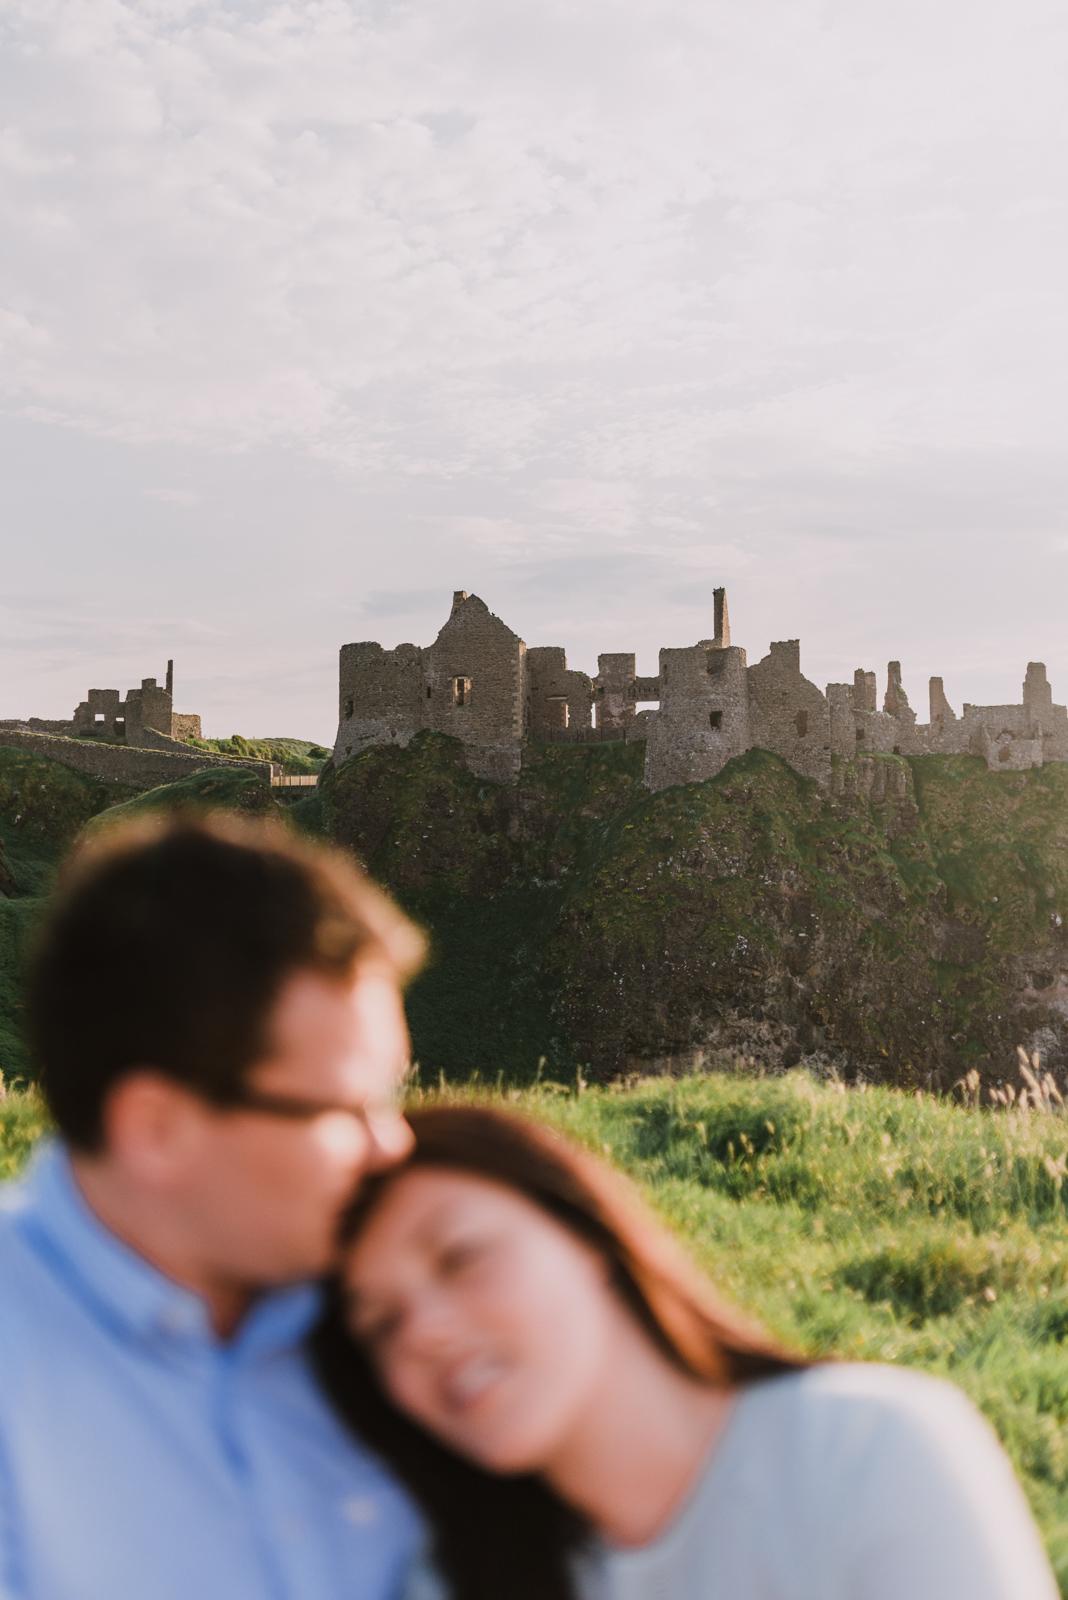 sunset engagement photos by Hello, Sugar taken at Dunluce Castle, Northern Ireland-12.jpg